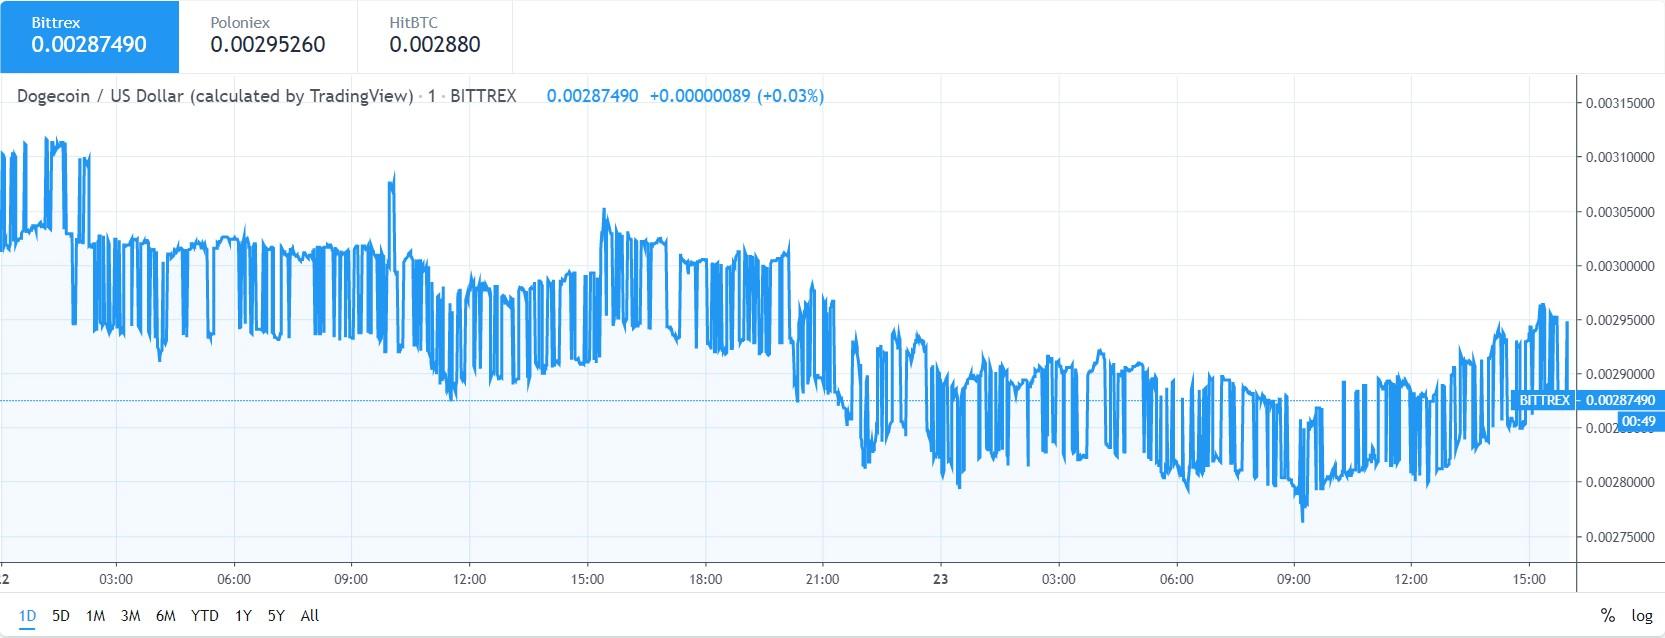 Doge price analysis 23 may